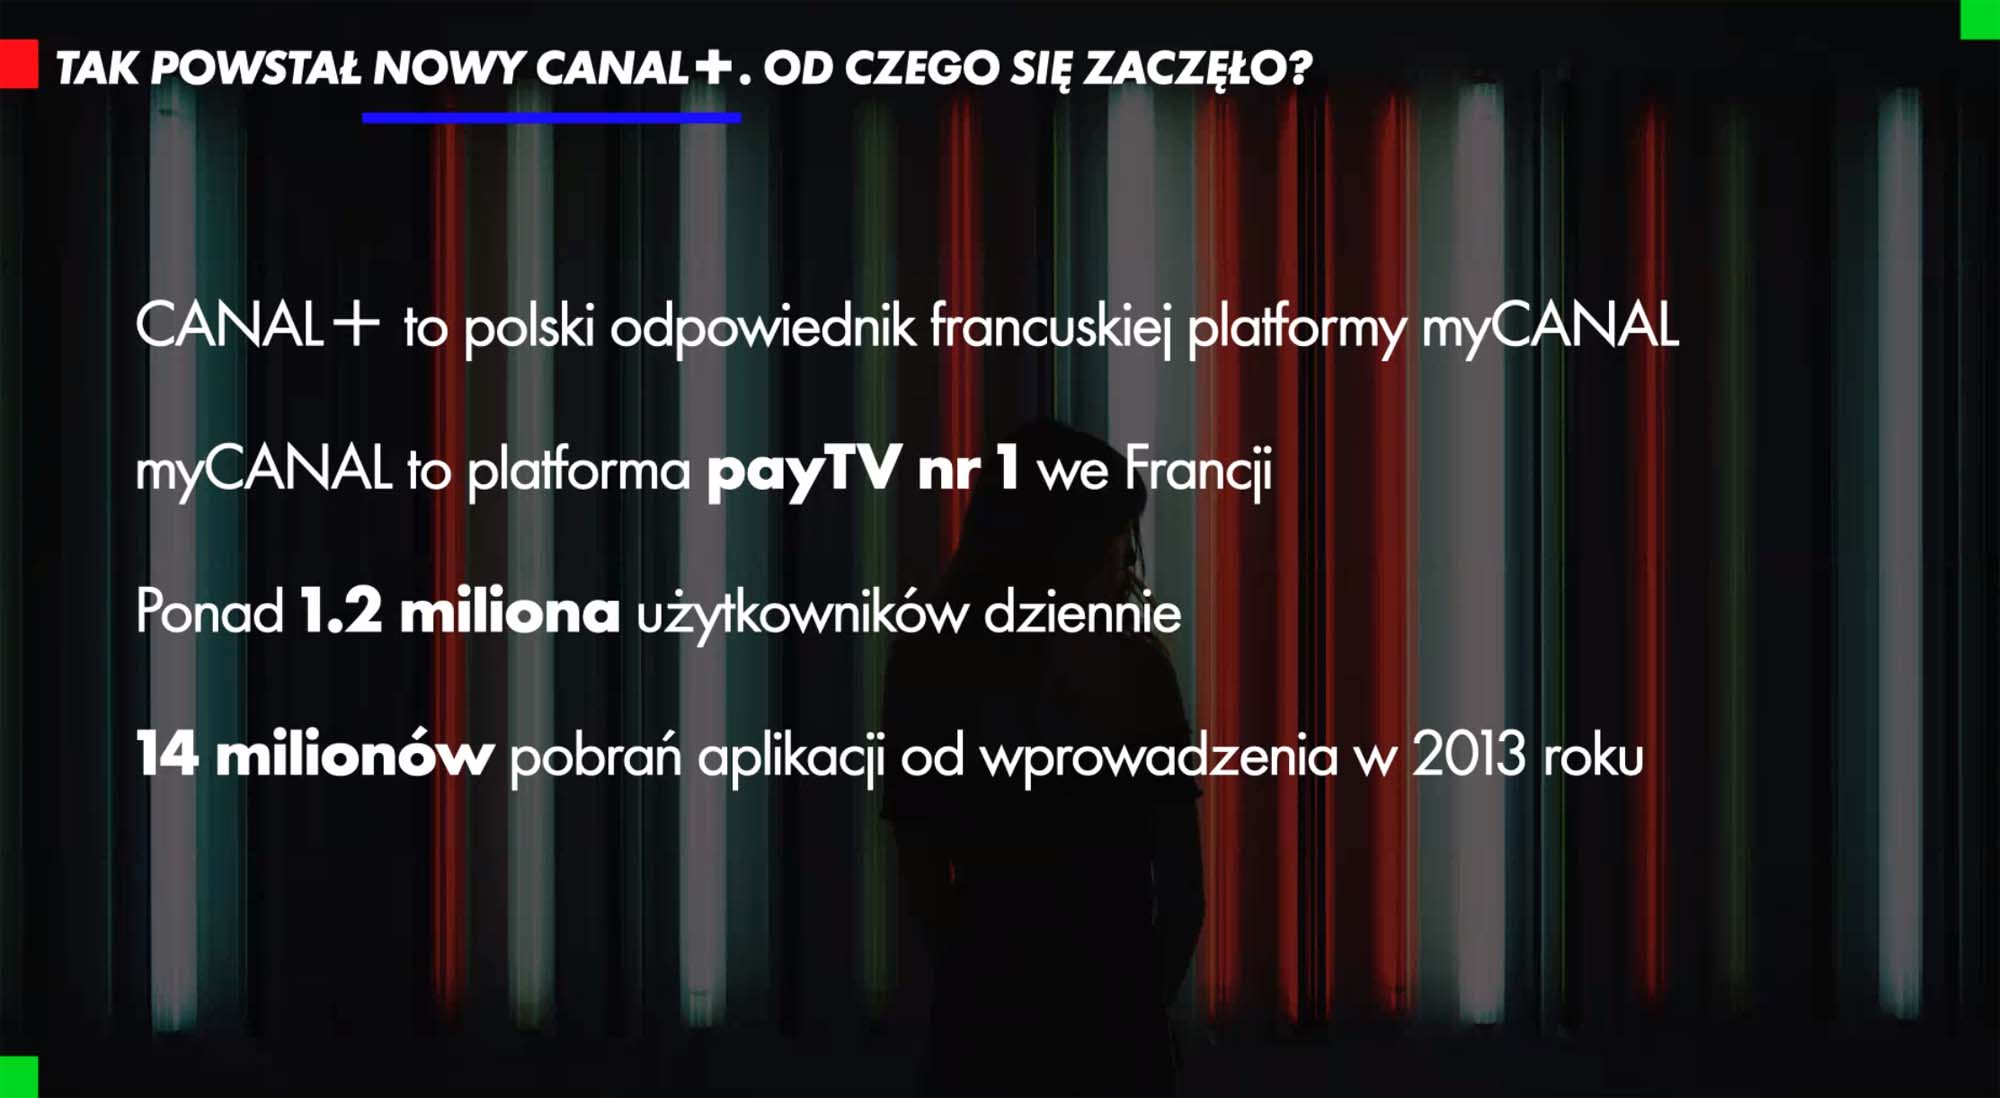 7_canal_plus_prez_nowa_usluga_vod_202005